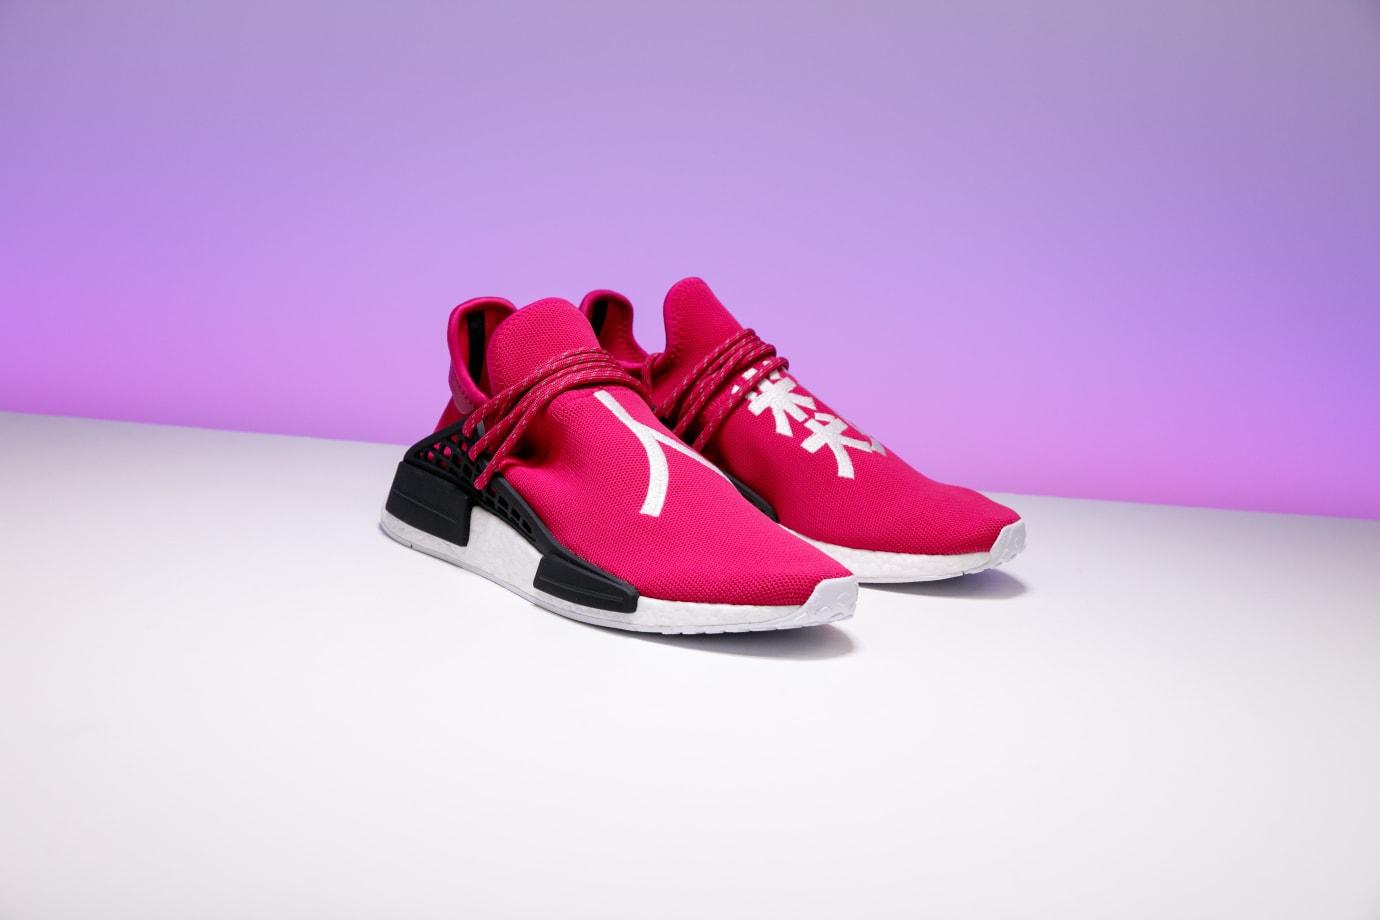 wholesale dealer 0e311 bd7c8 Pharrell x Adidas NMD HU